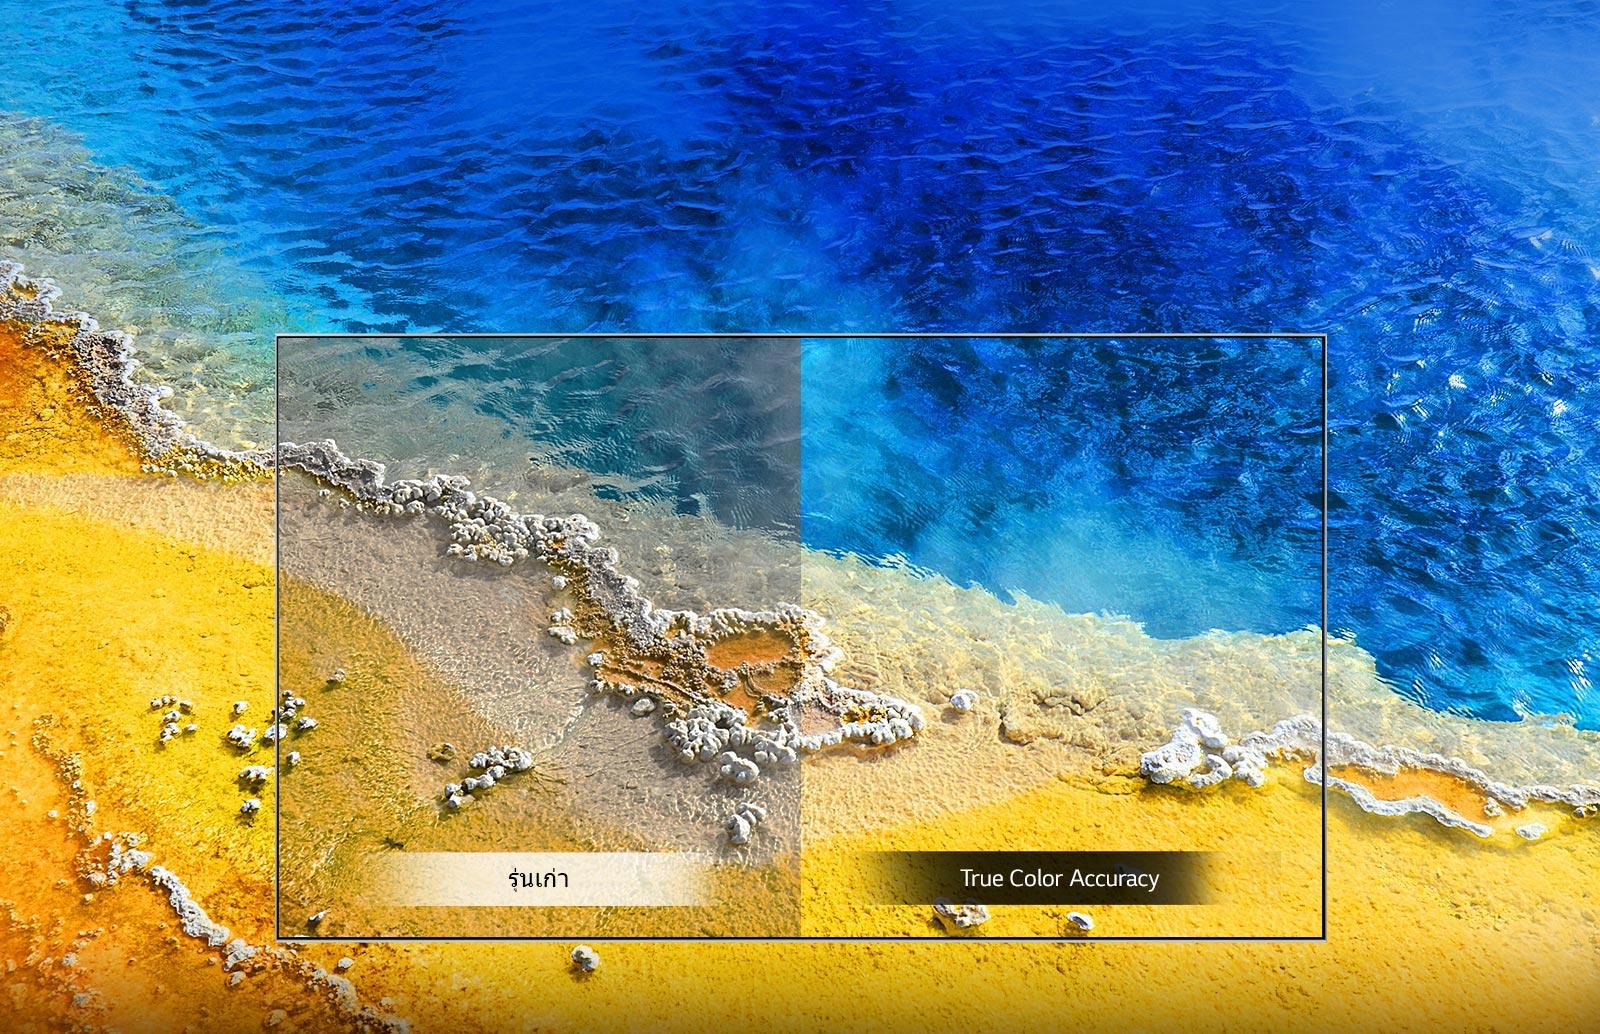 TV-UHD-70-UM73-04-True-Color-Accuracy-Desktop